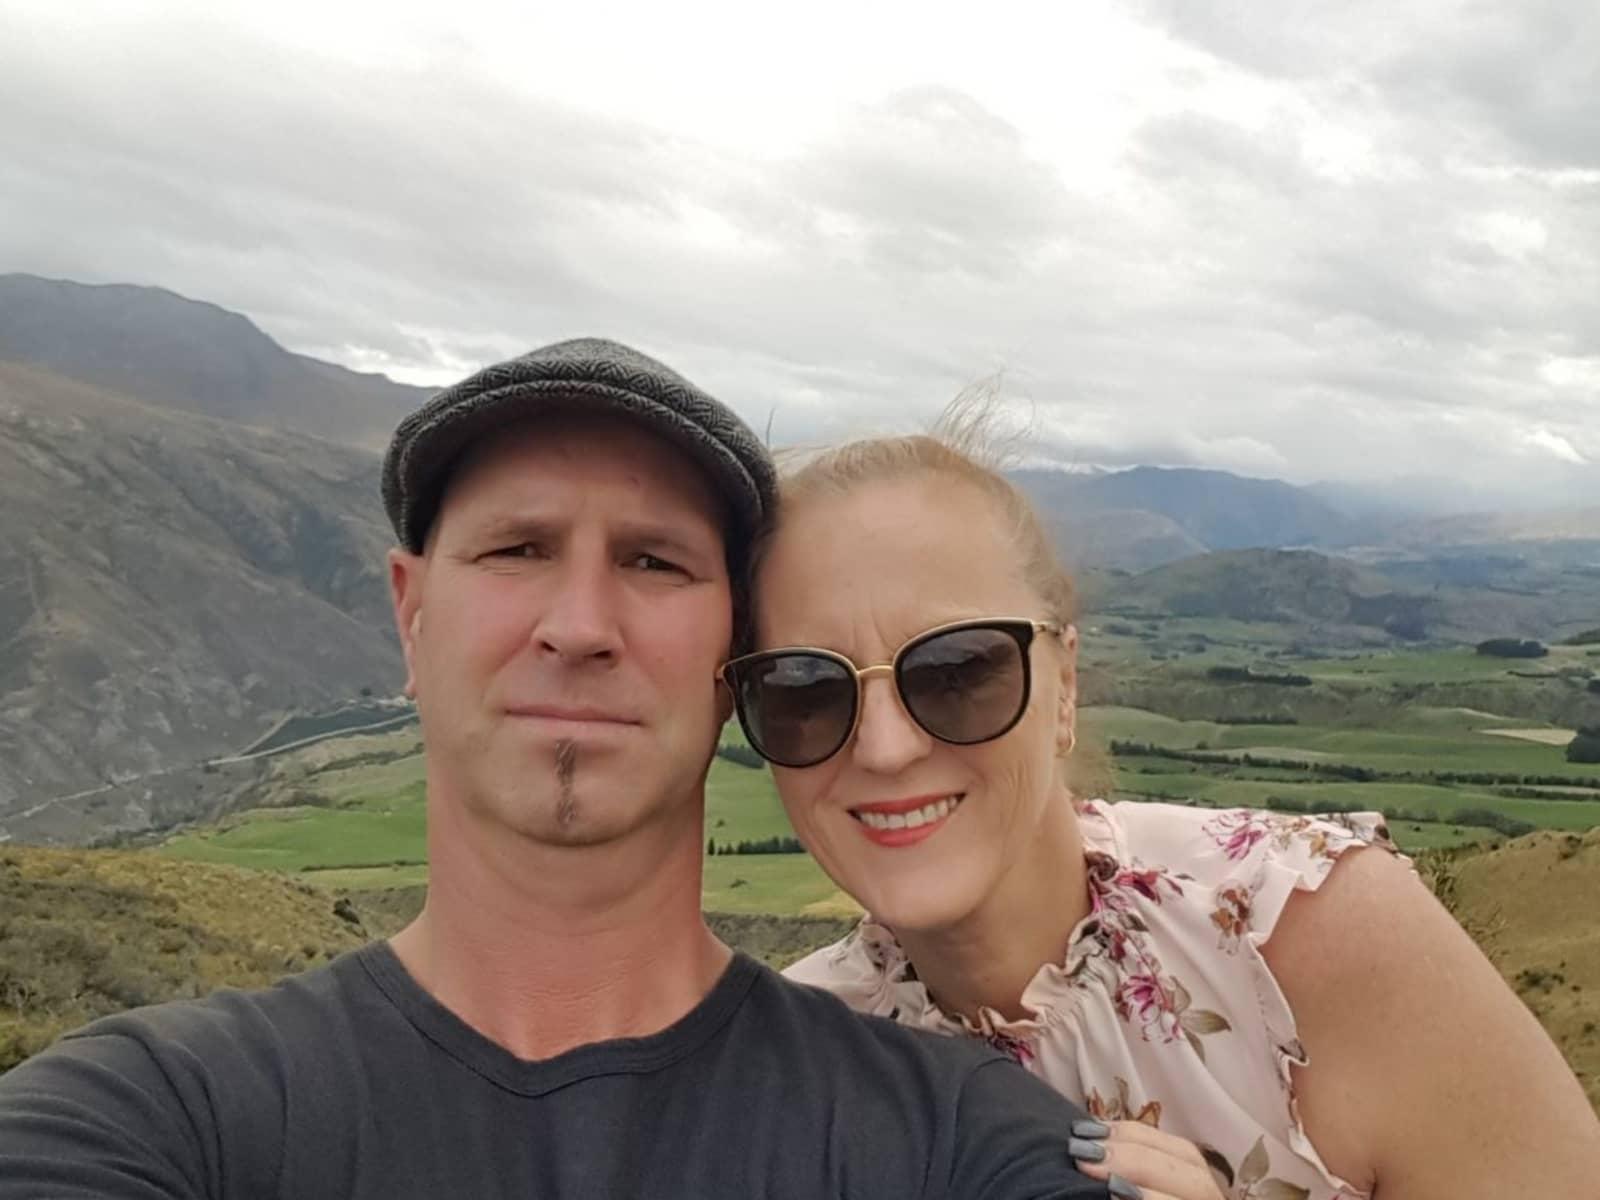 Michele & Tim from Mooloolaba, Queensland, Australia